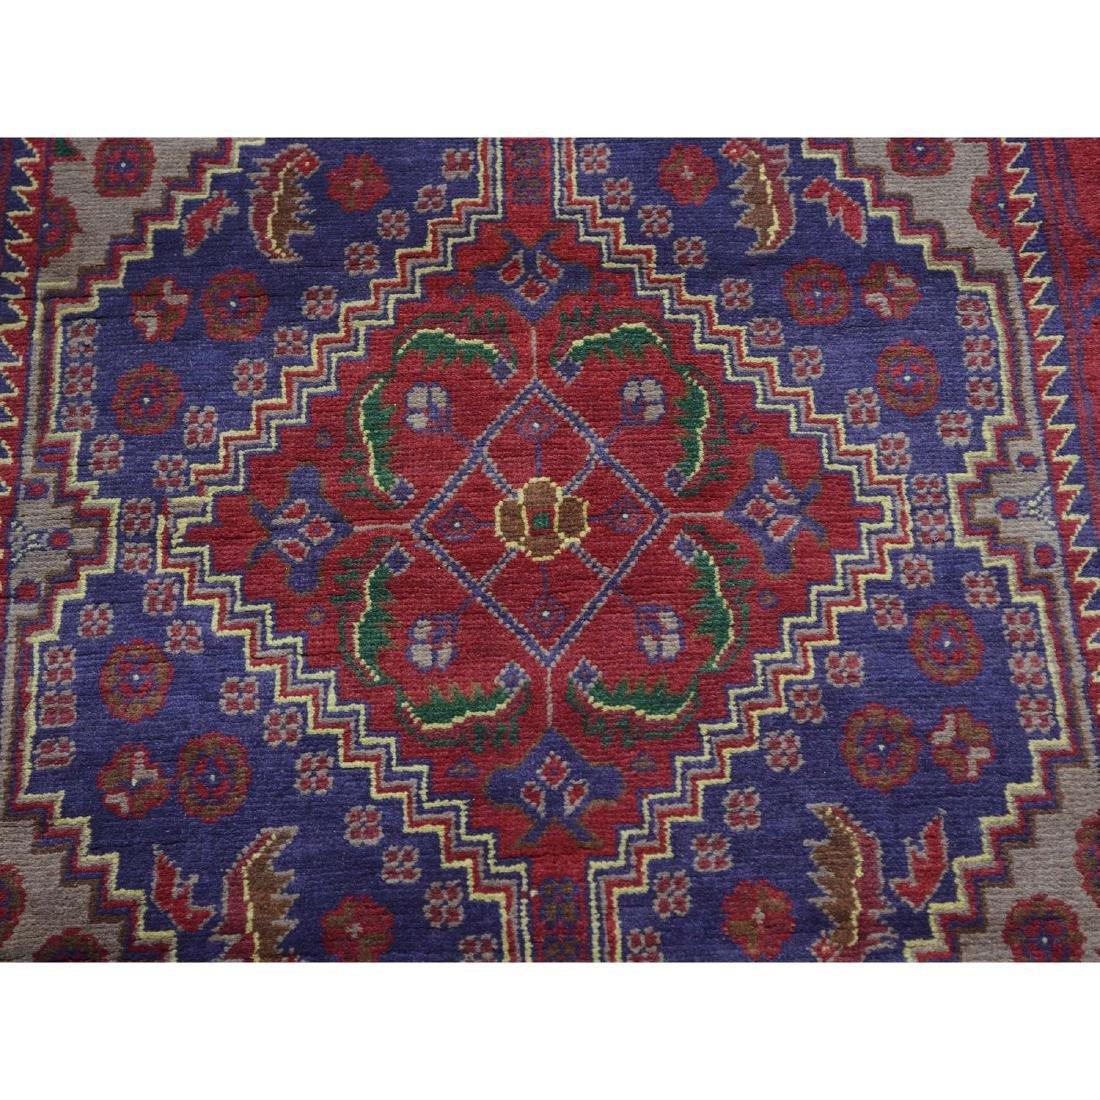 Runner Afghan Khamyab Handmade Rug 2.7x18.4 - 4